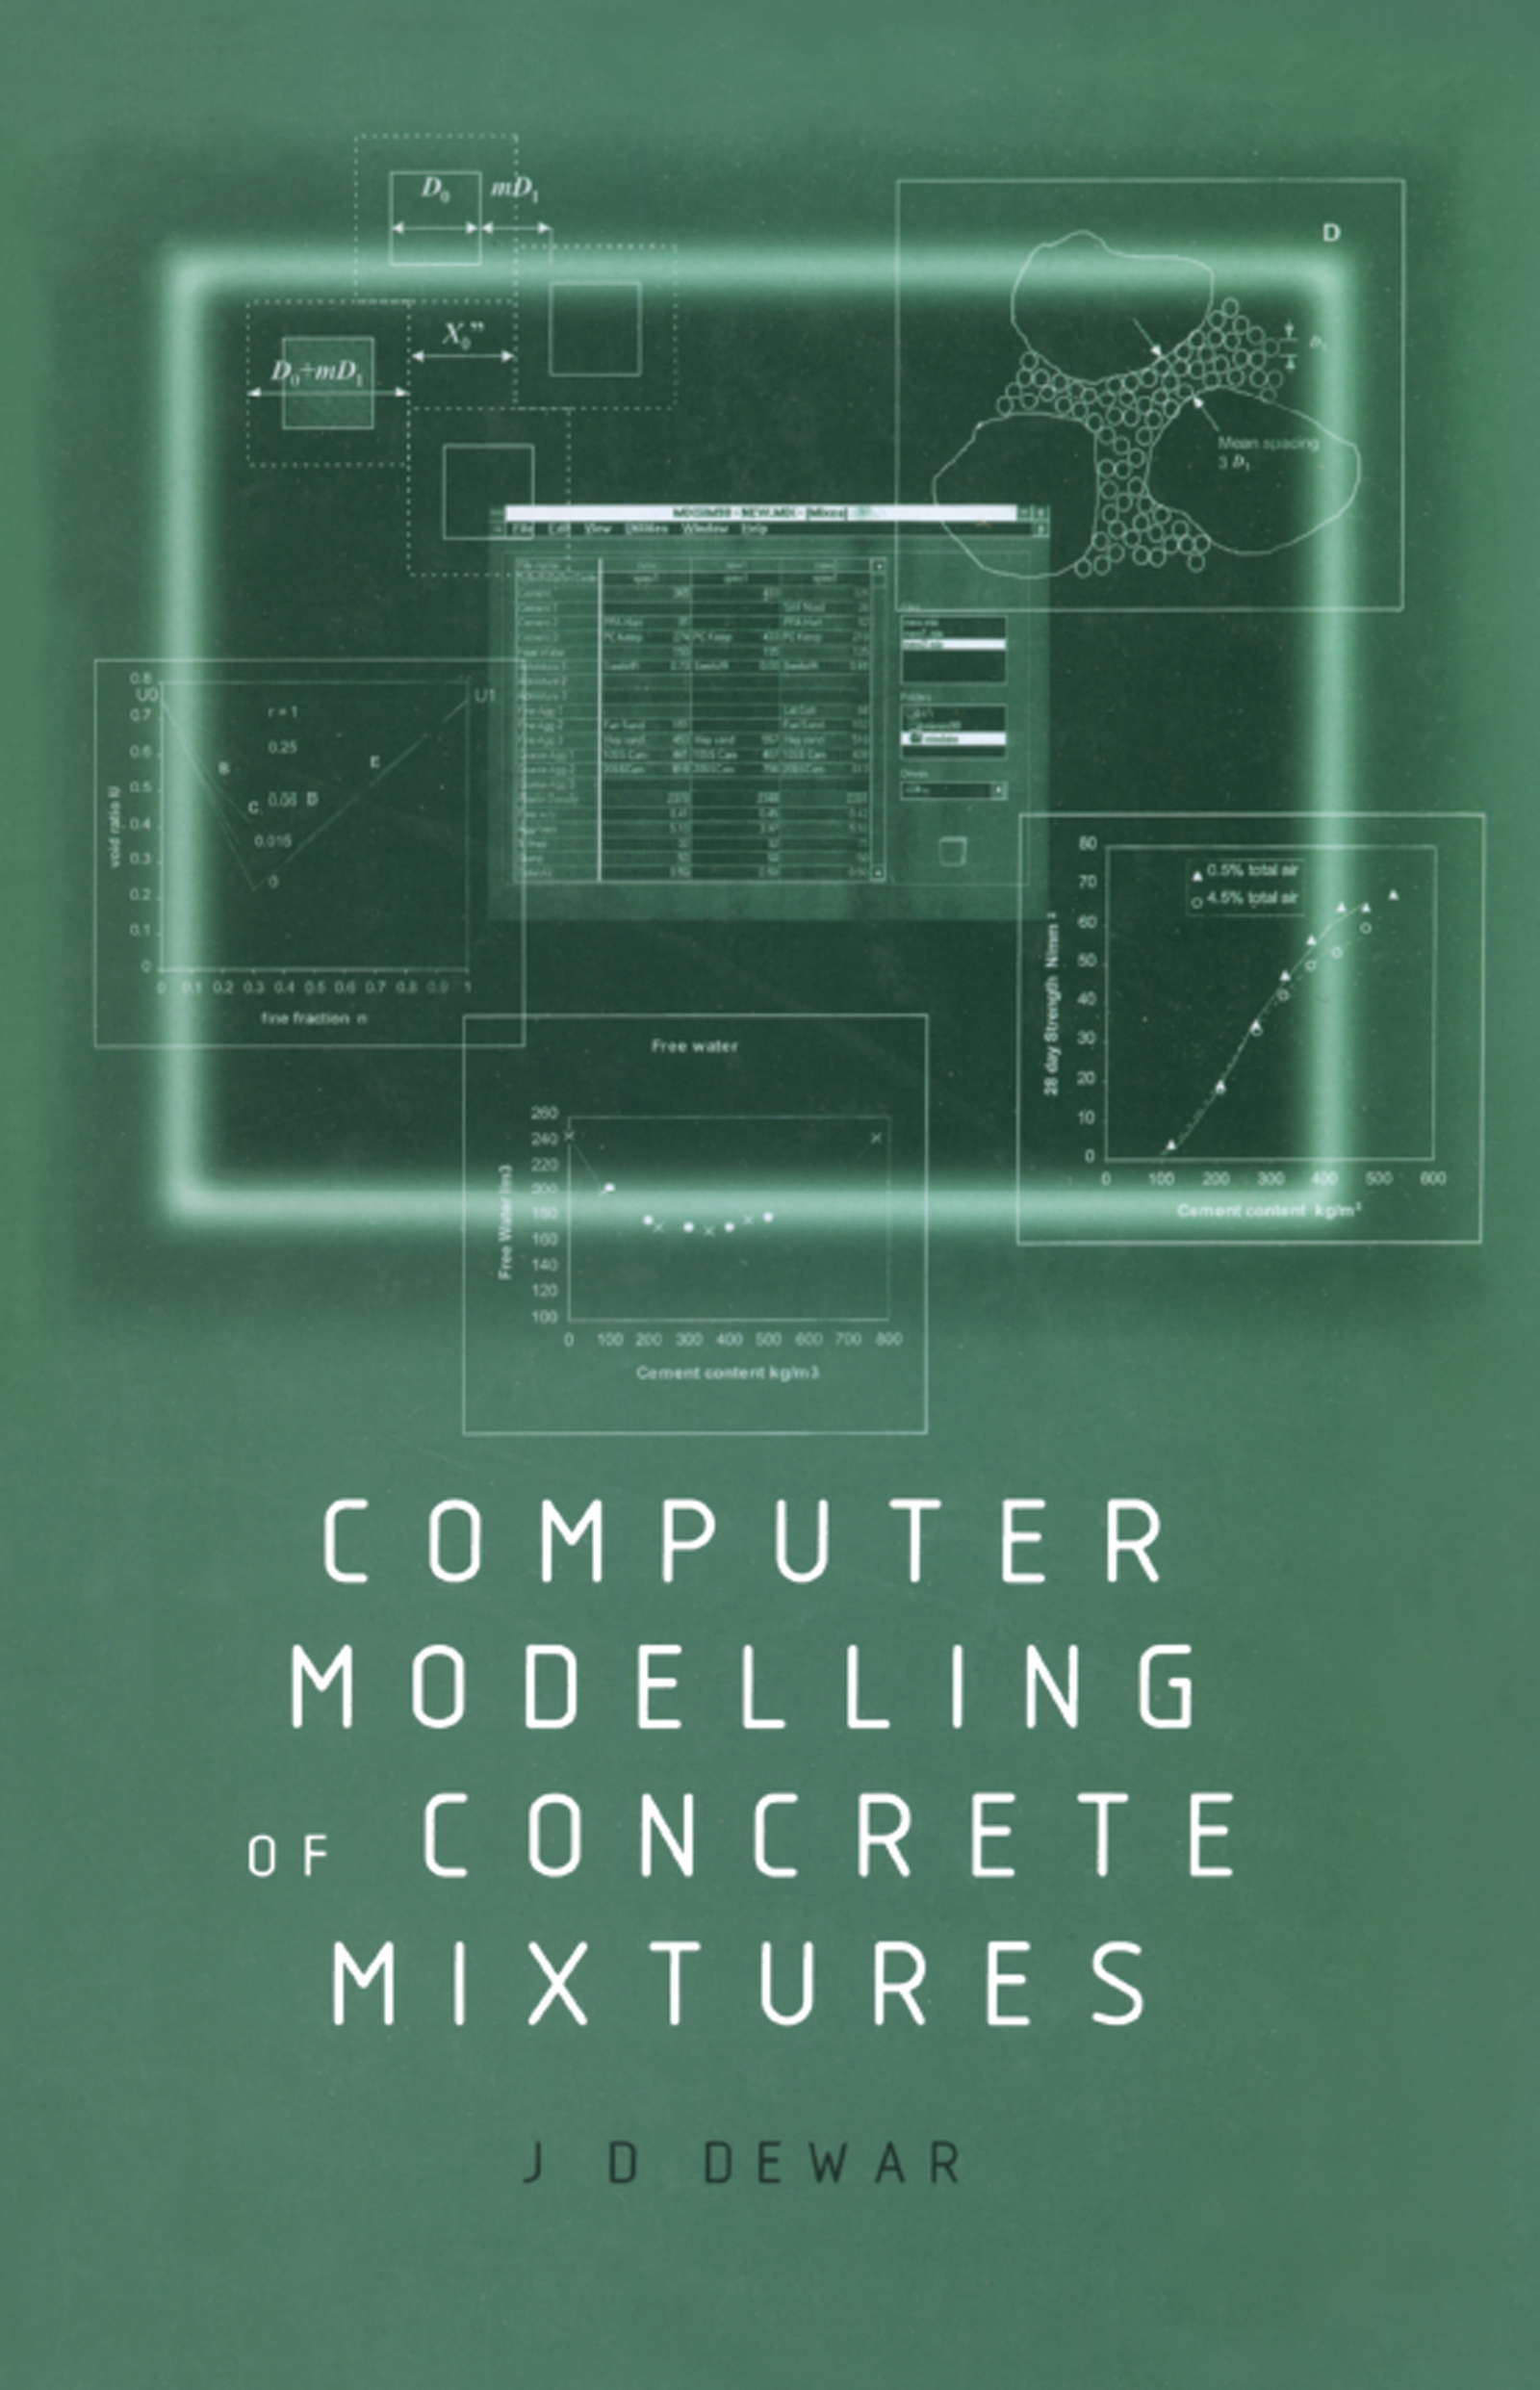 Computer Modelling of Concrete Mixtures